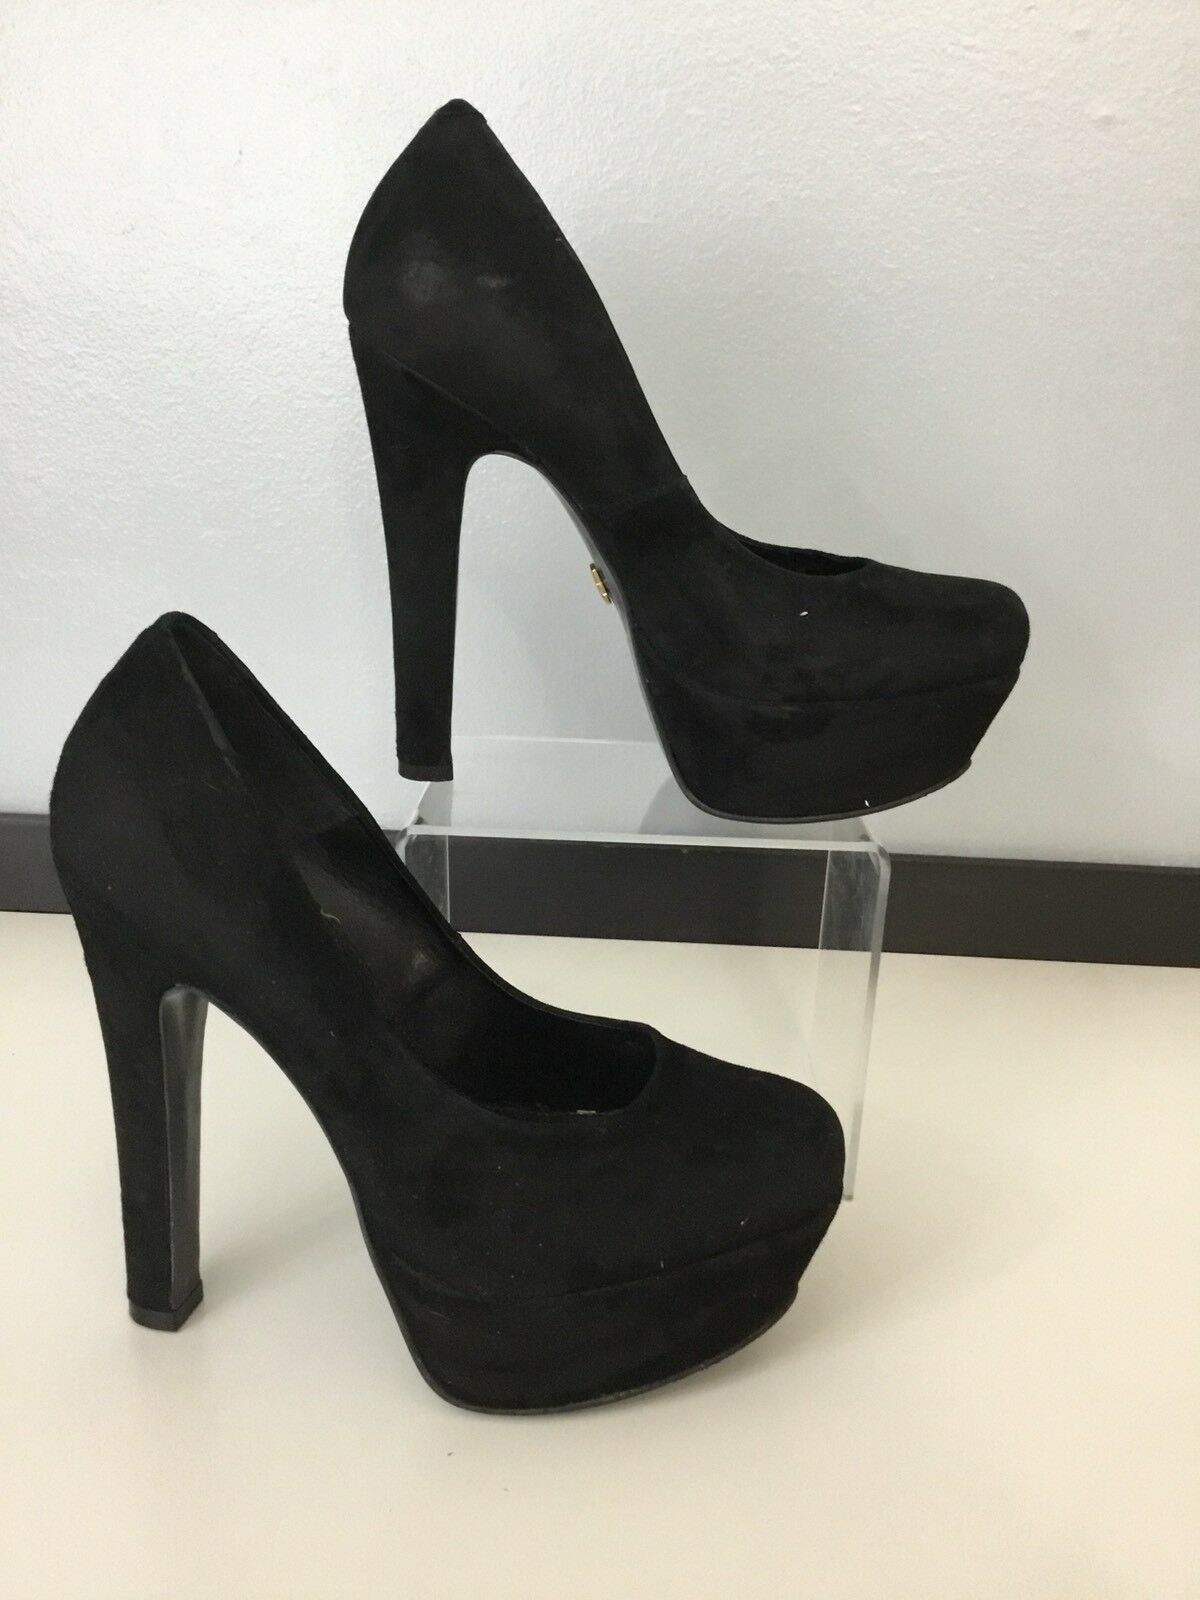 Kurt Geiger Kg Womens Black Faux Suede shoes High Heels Size Uk 5 Eu 38 VGC